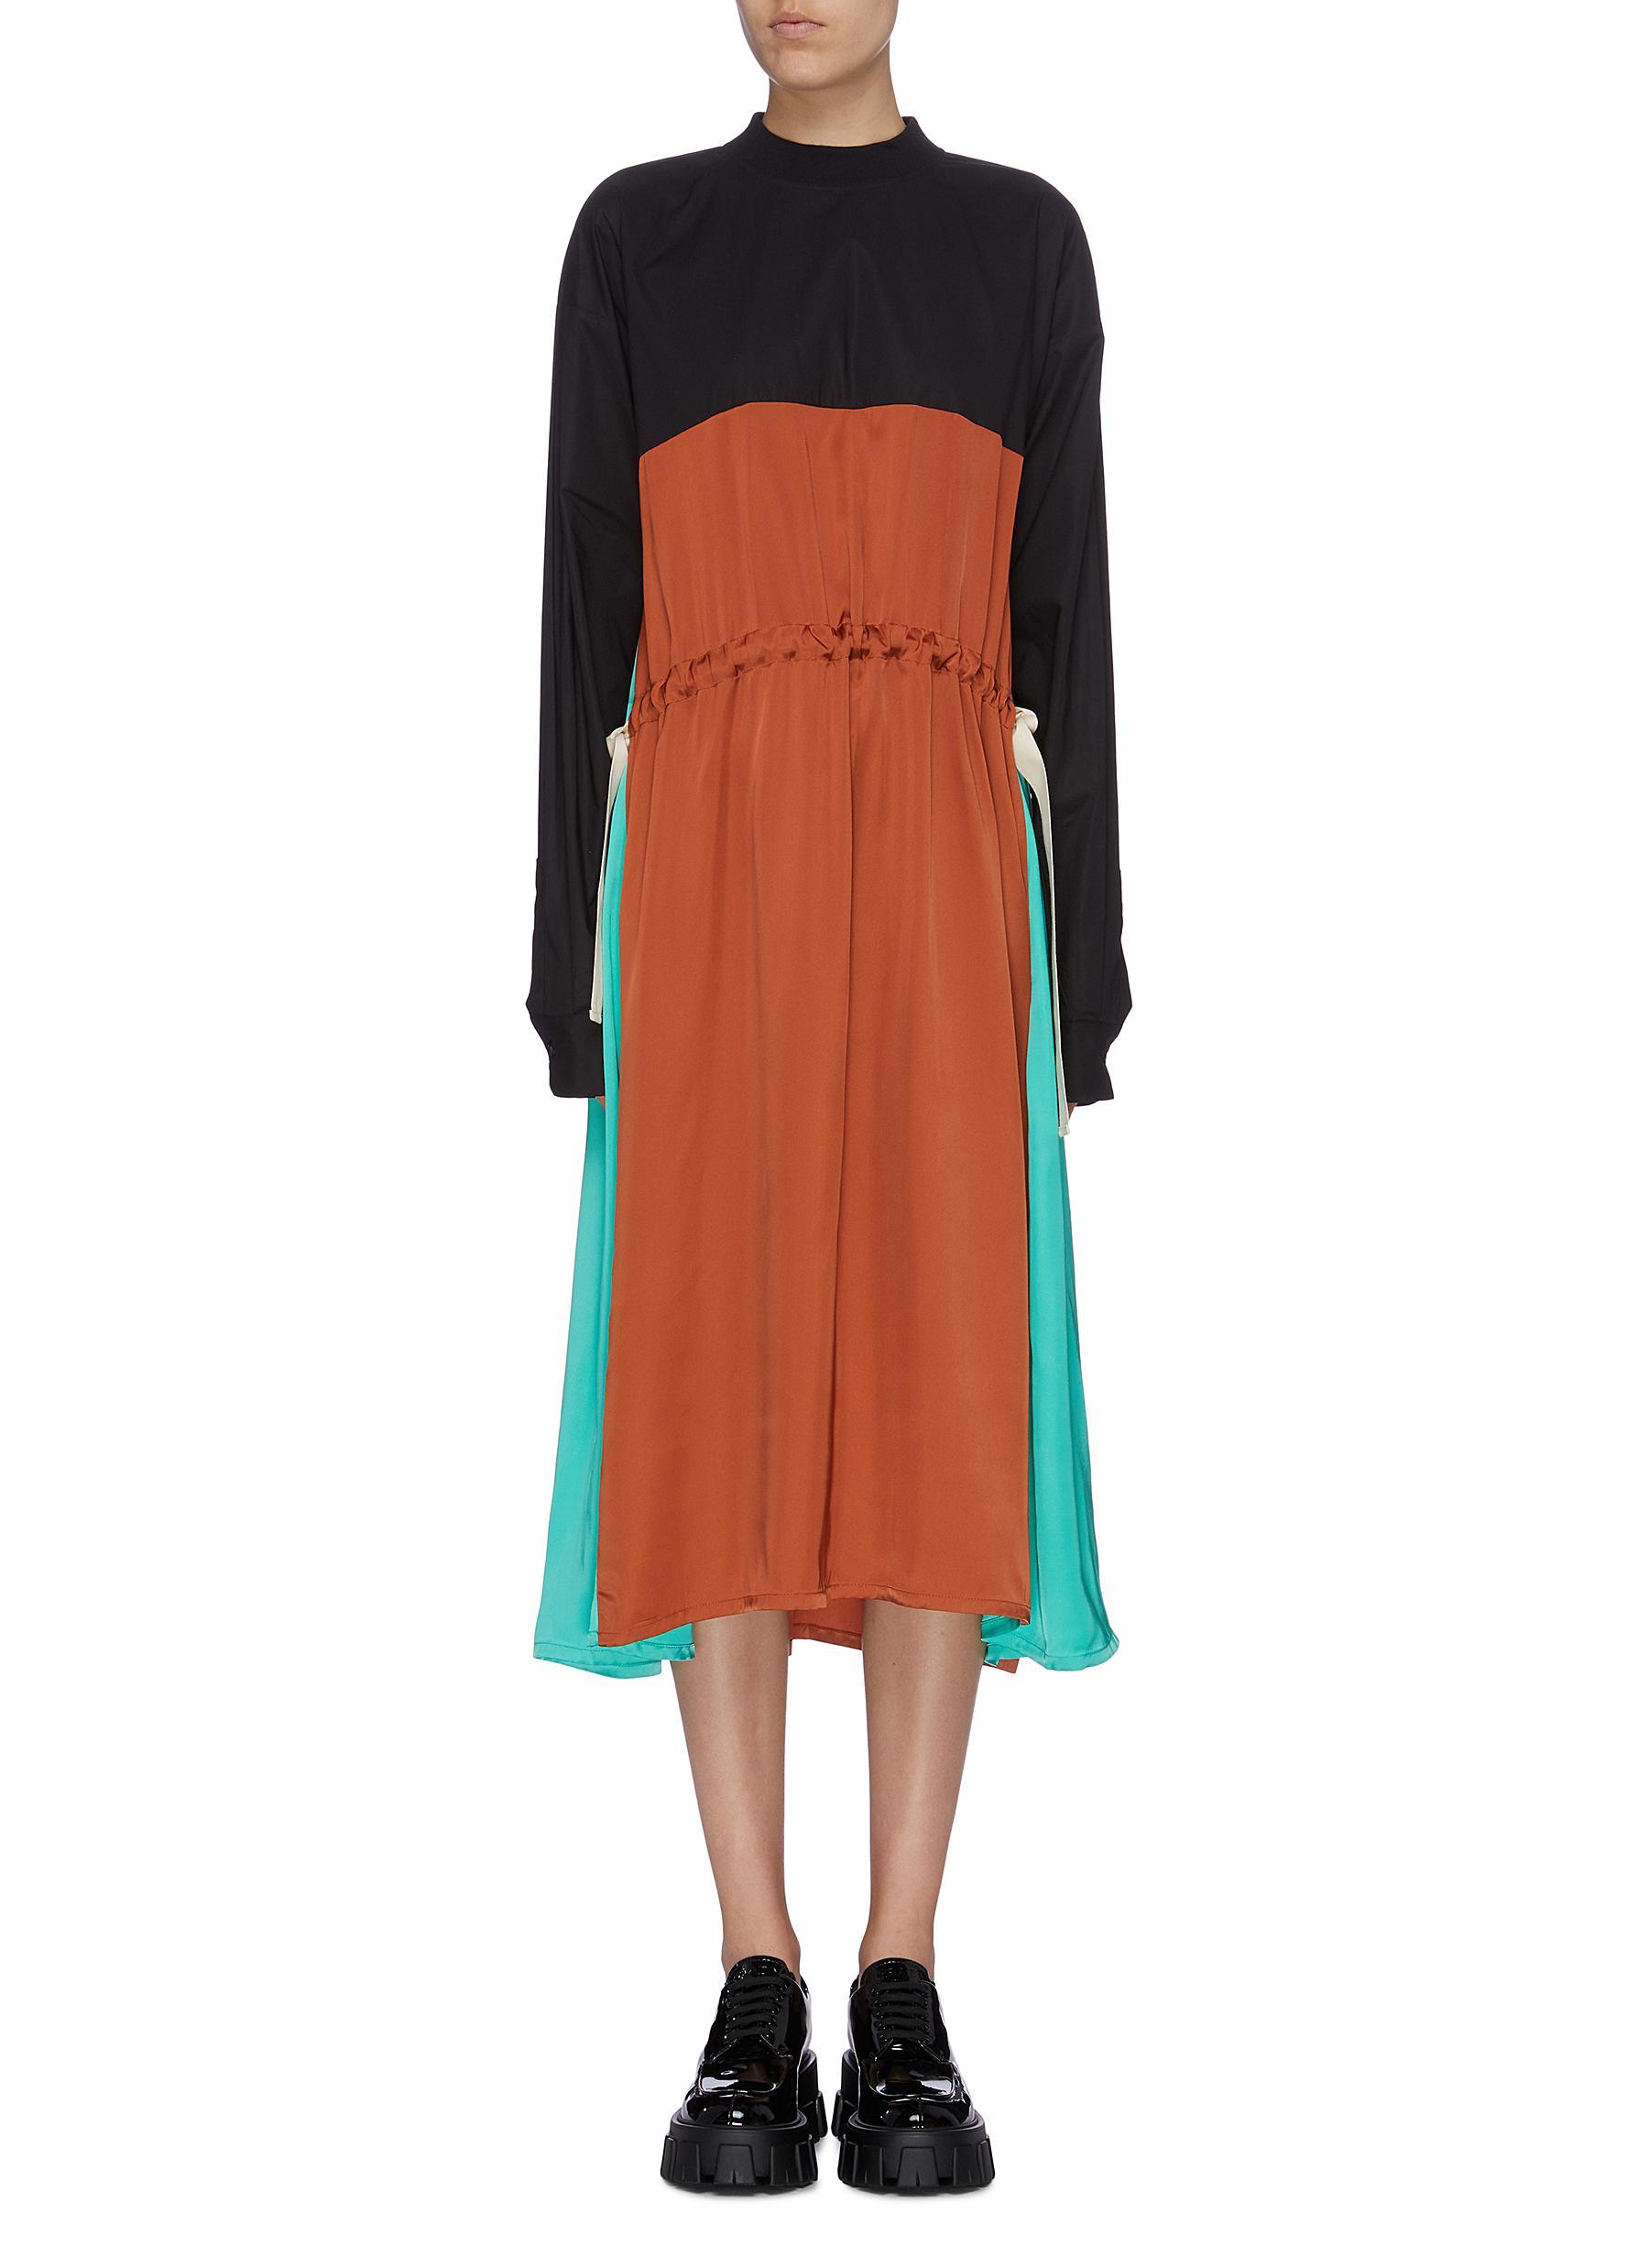 Drawstring waist colourblock satin dress by Plan C